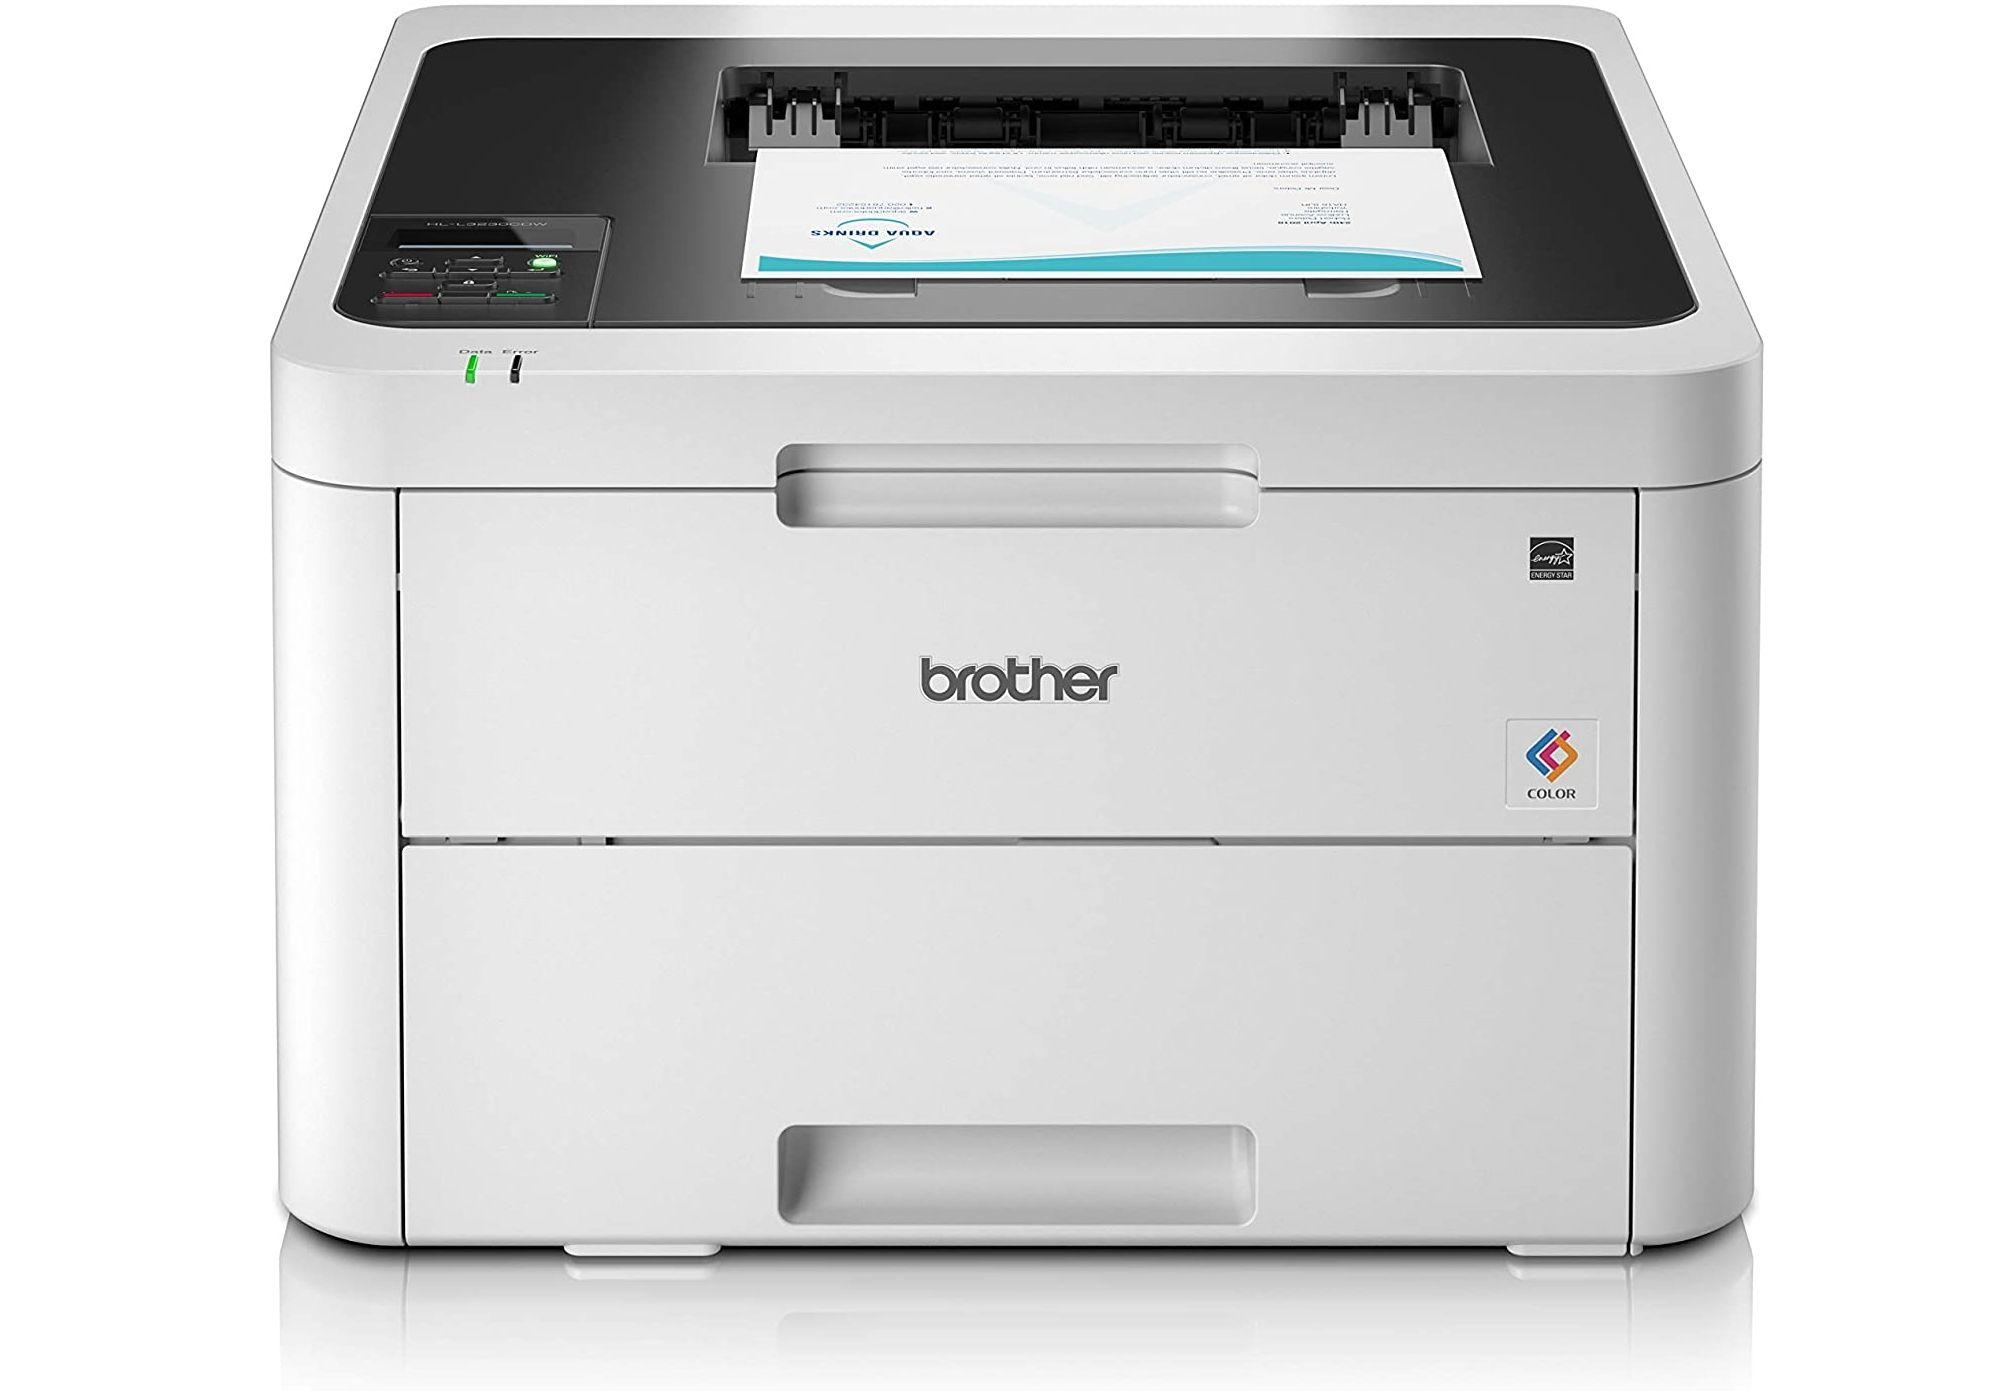 Mejores Impresoras Láser A Color Para Formato A3 Guía Hardware